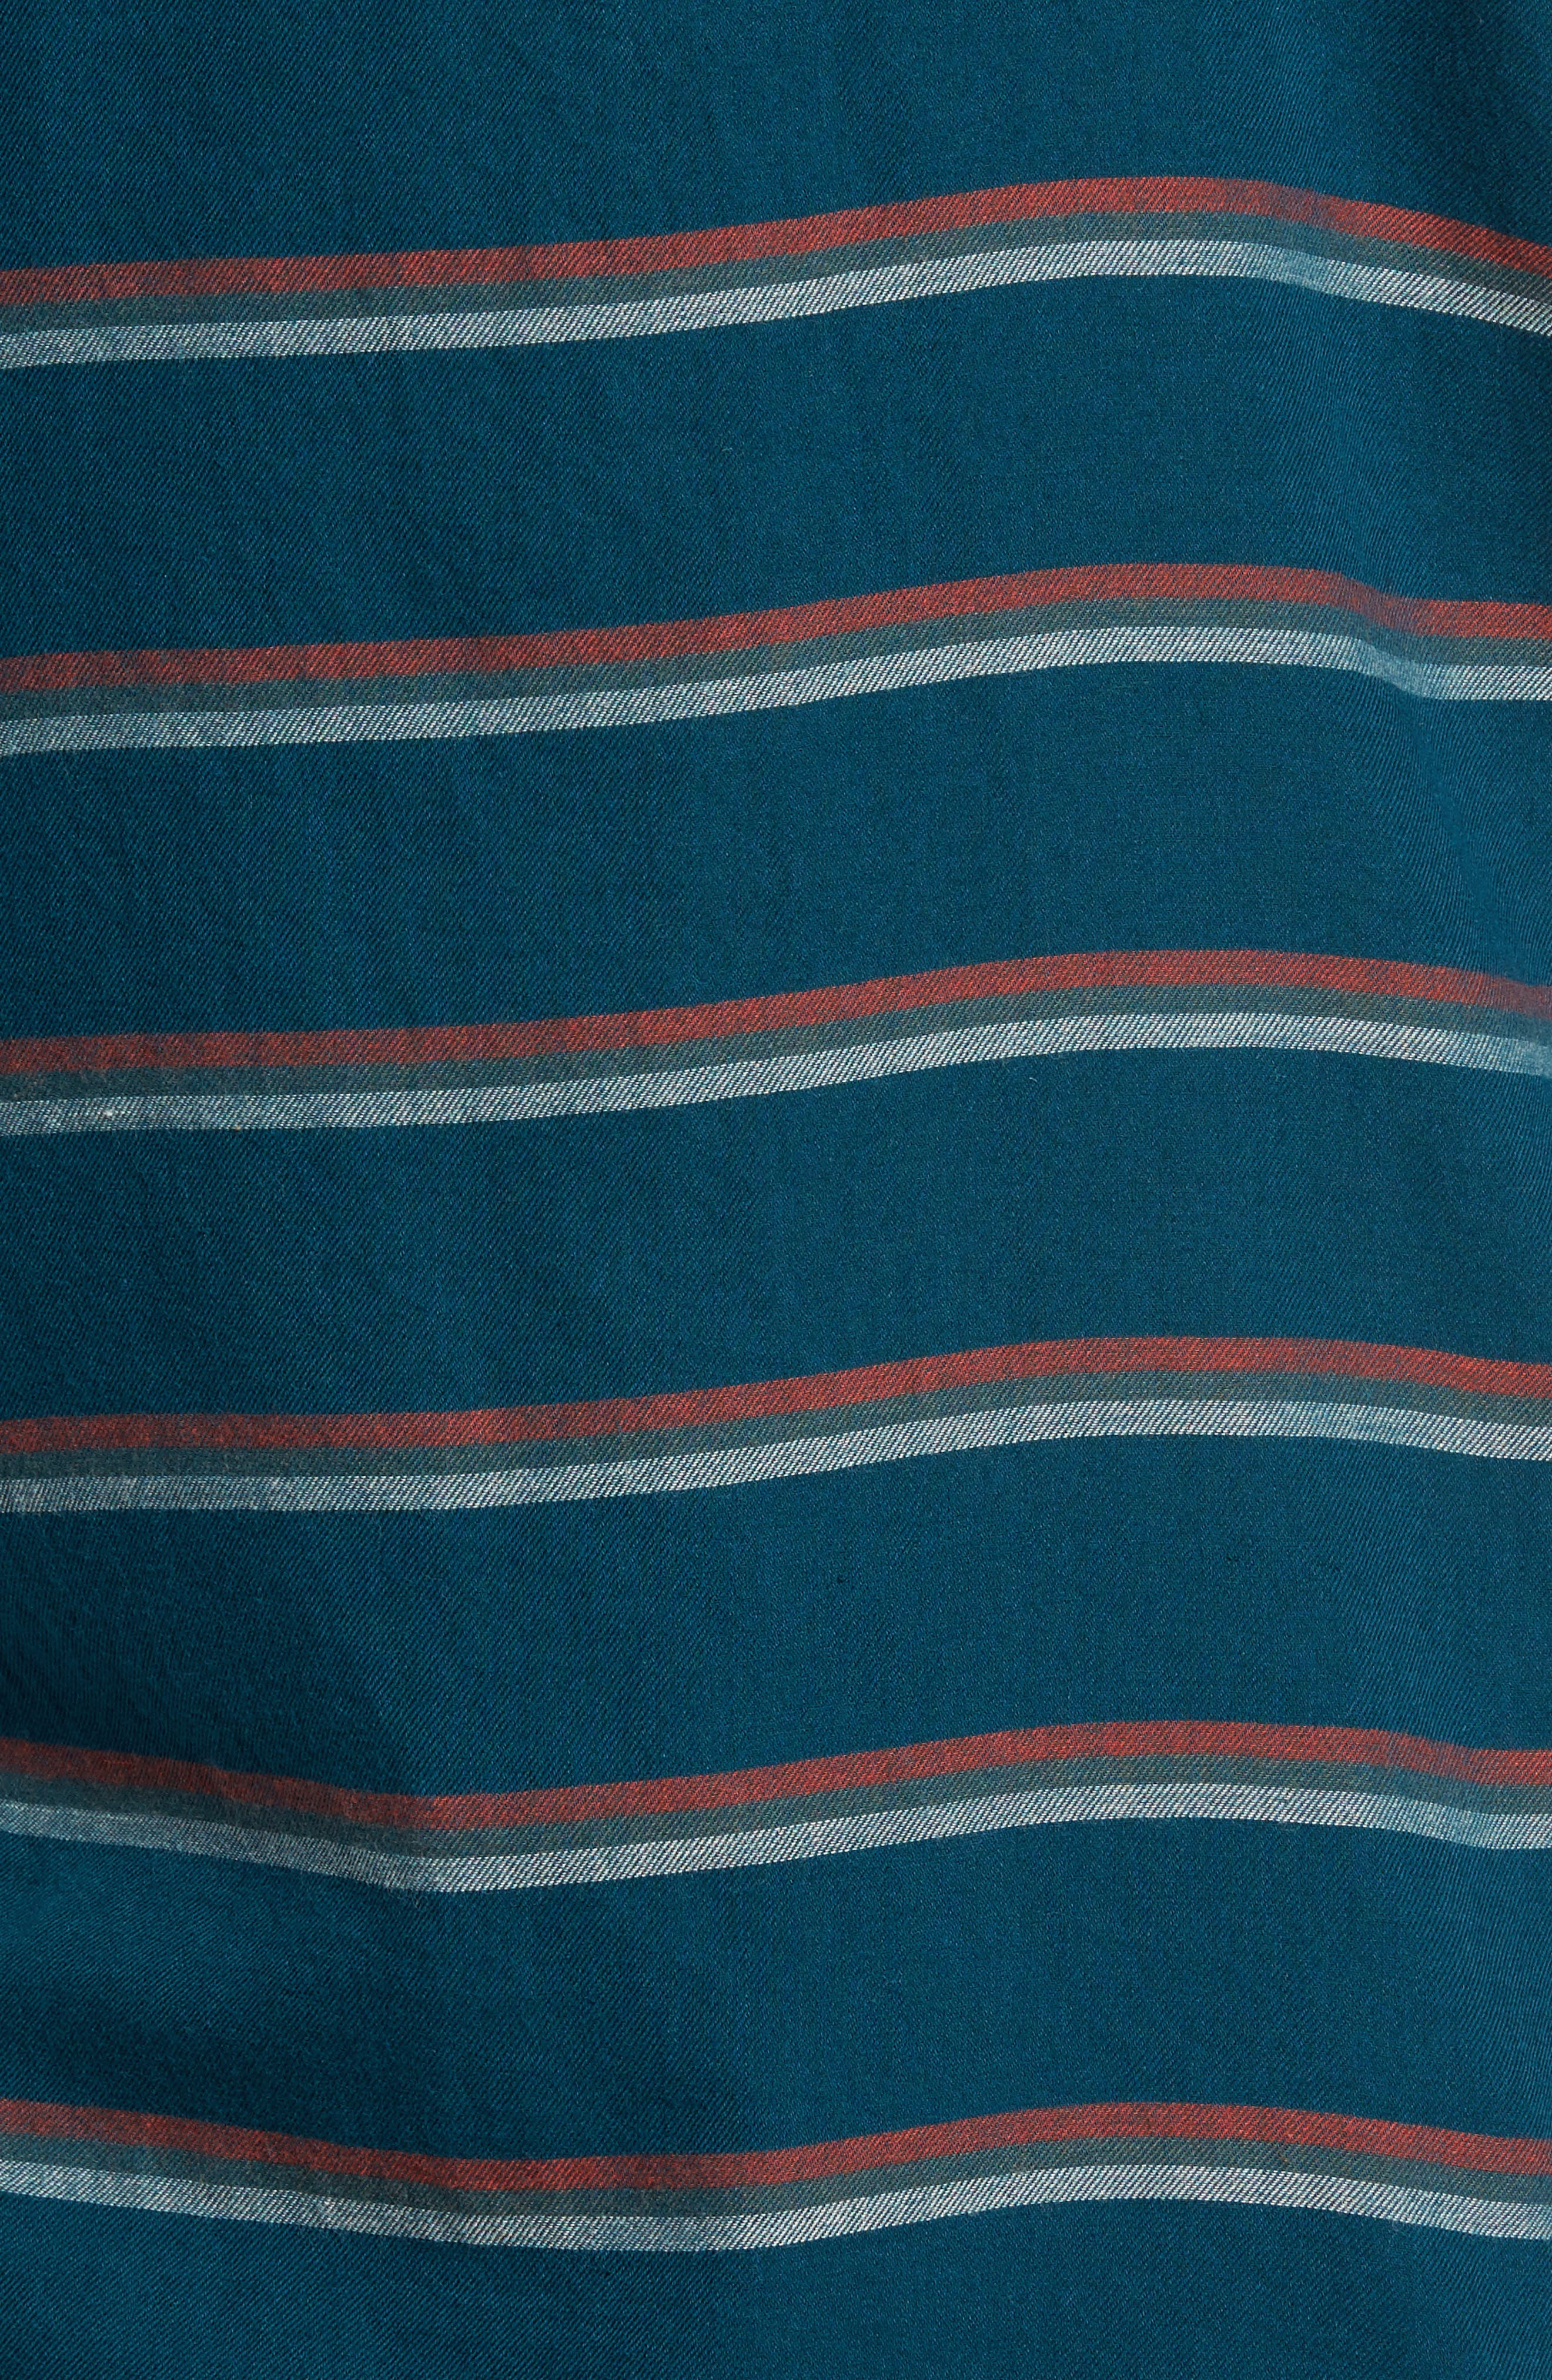 Stripe Twill Shirt,                             Alternate thumbnail 10, color,